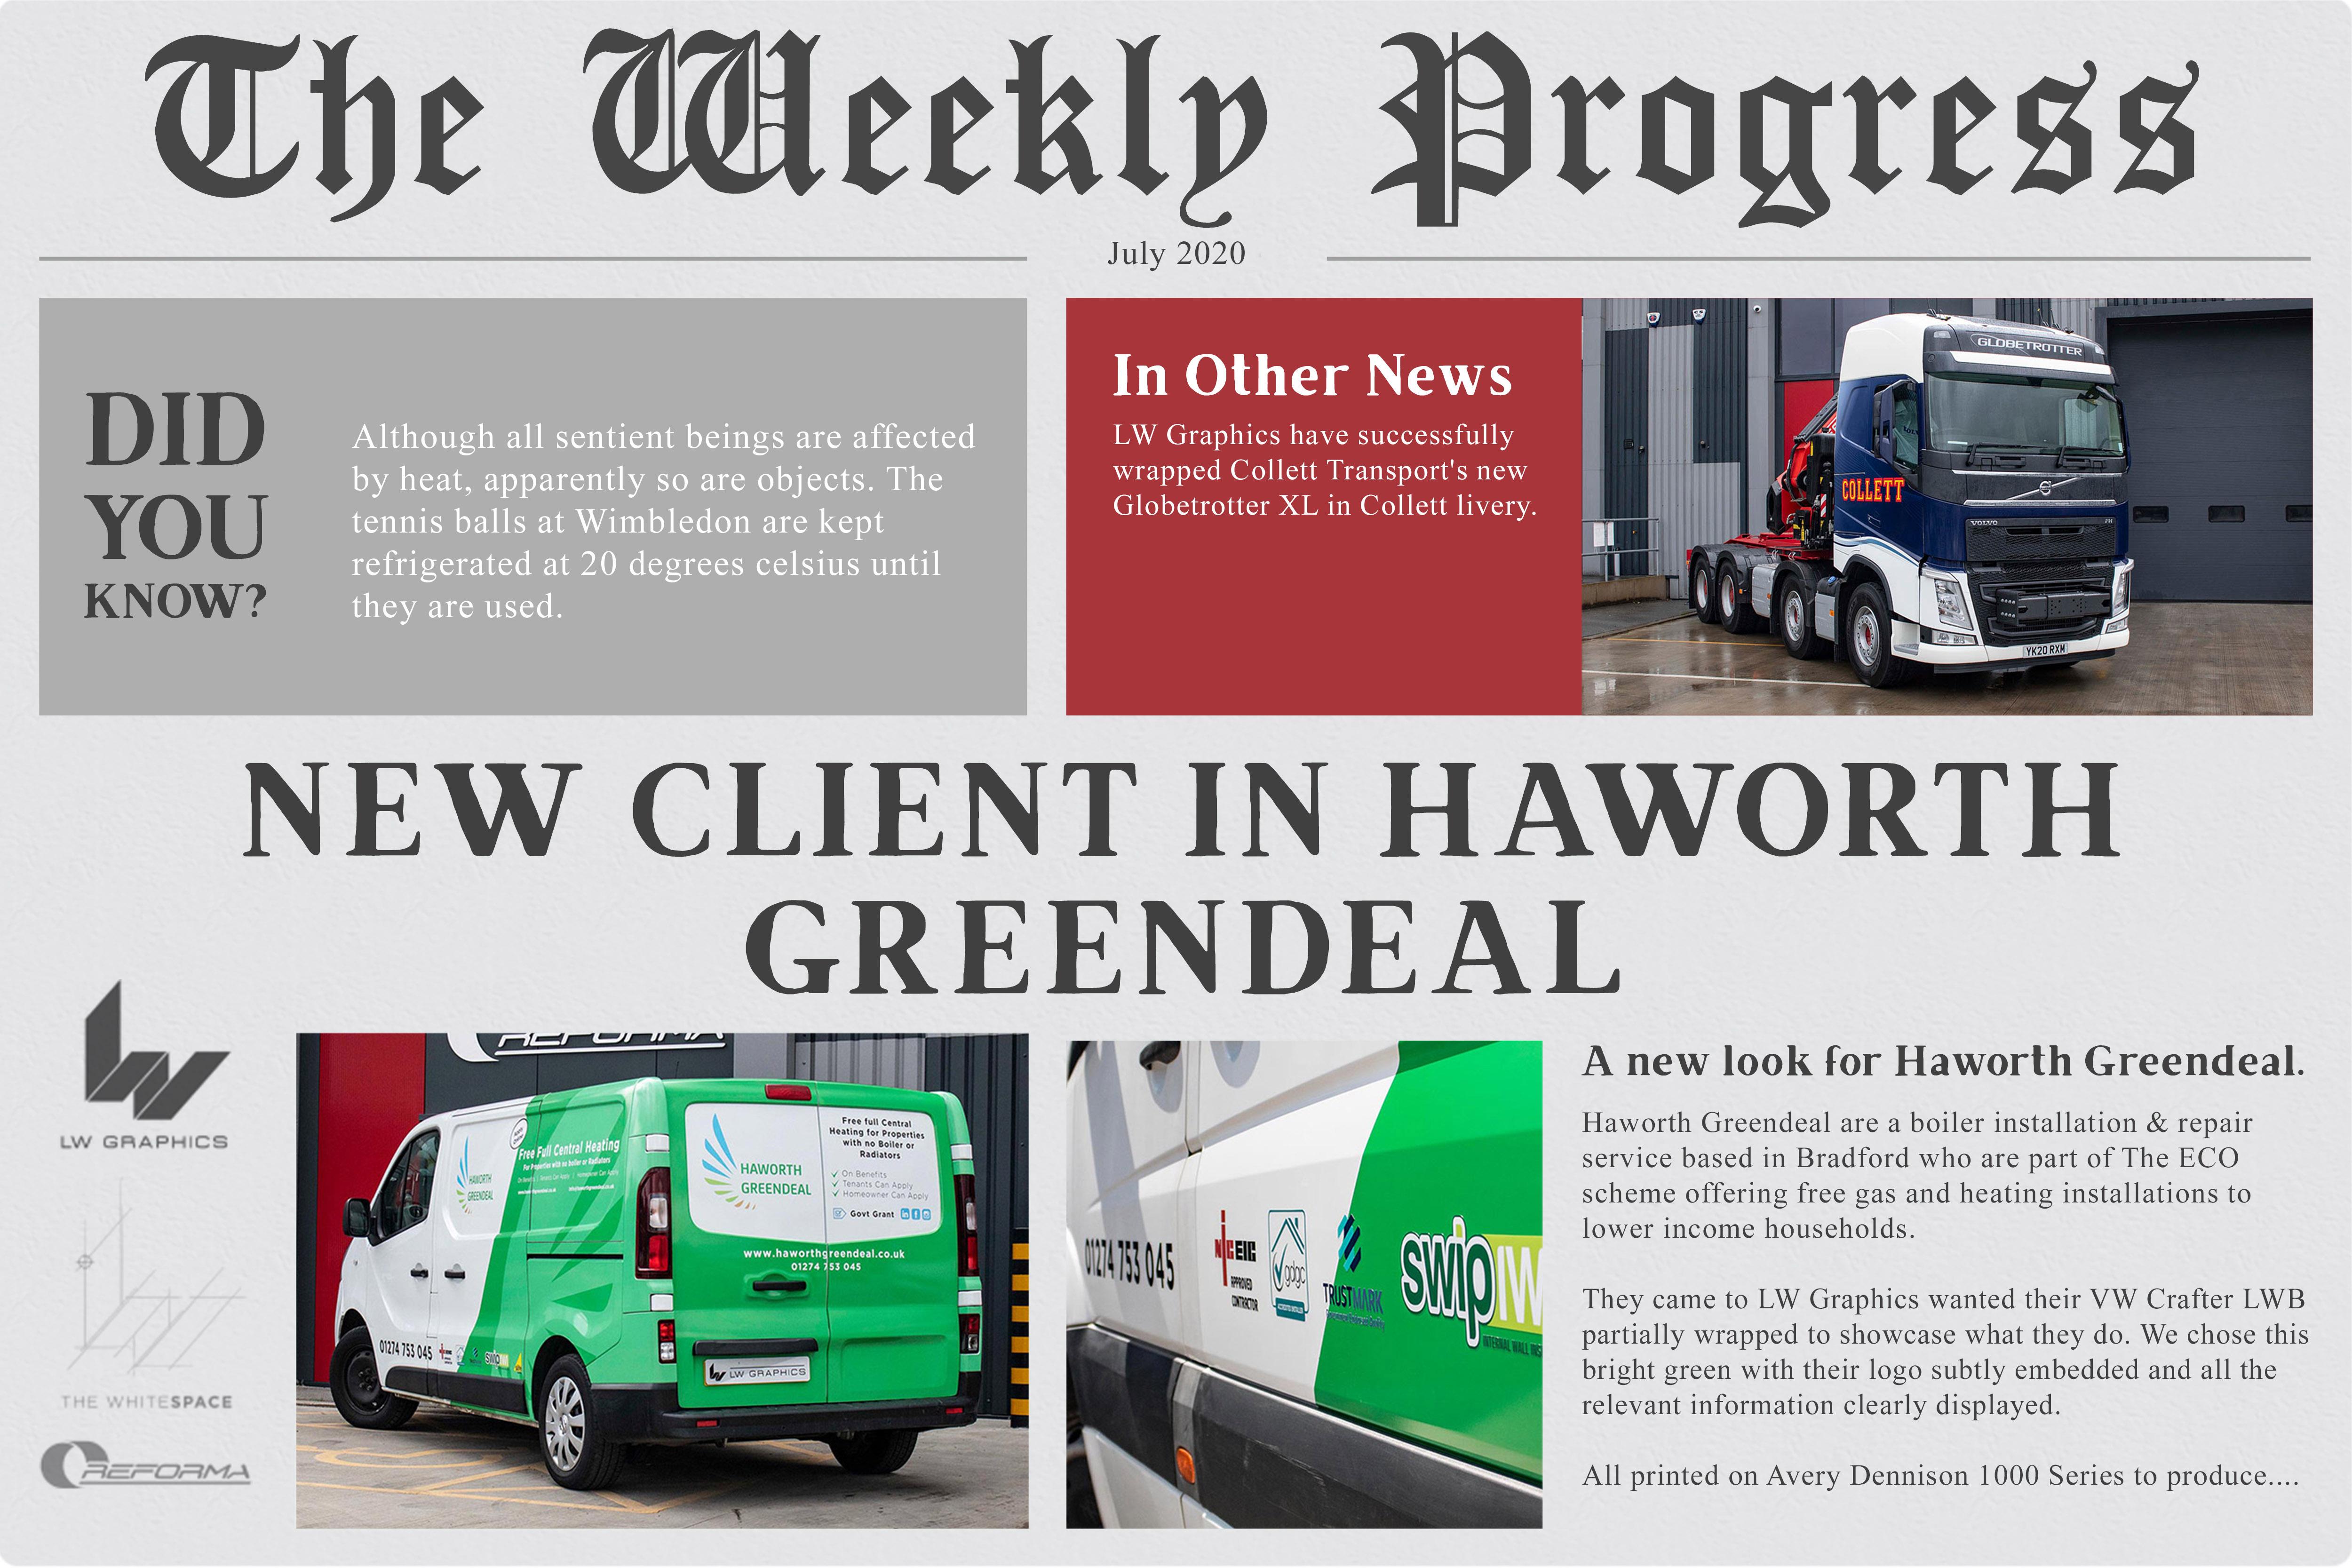 TWP 64 – Haworth Greendeal